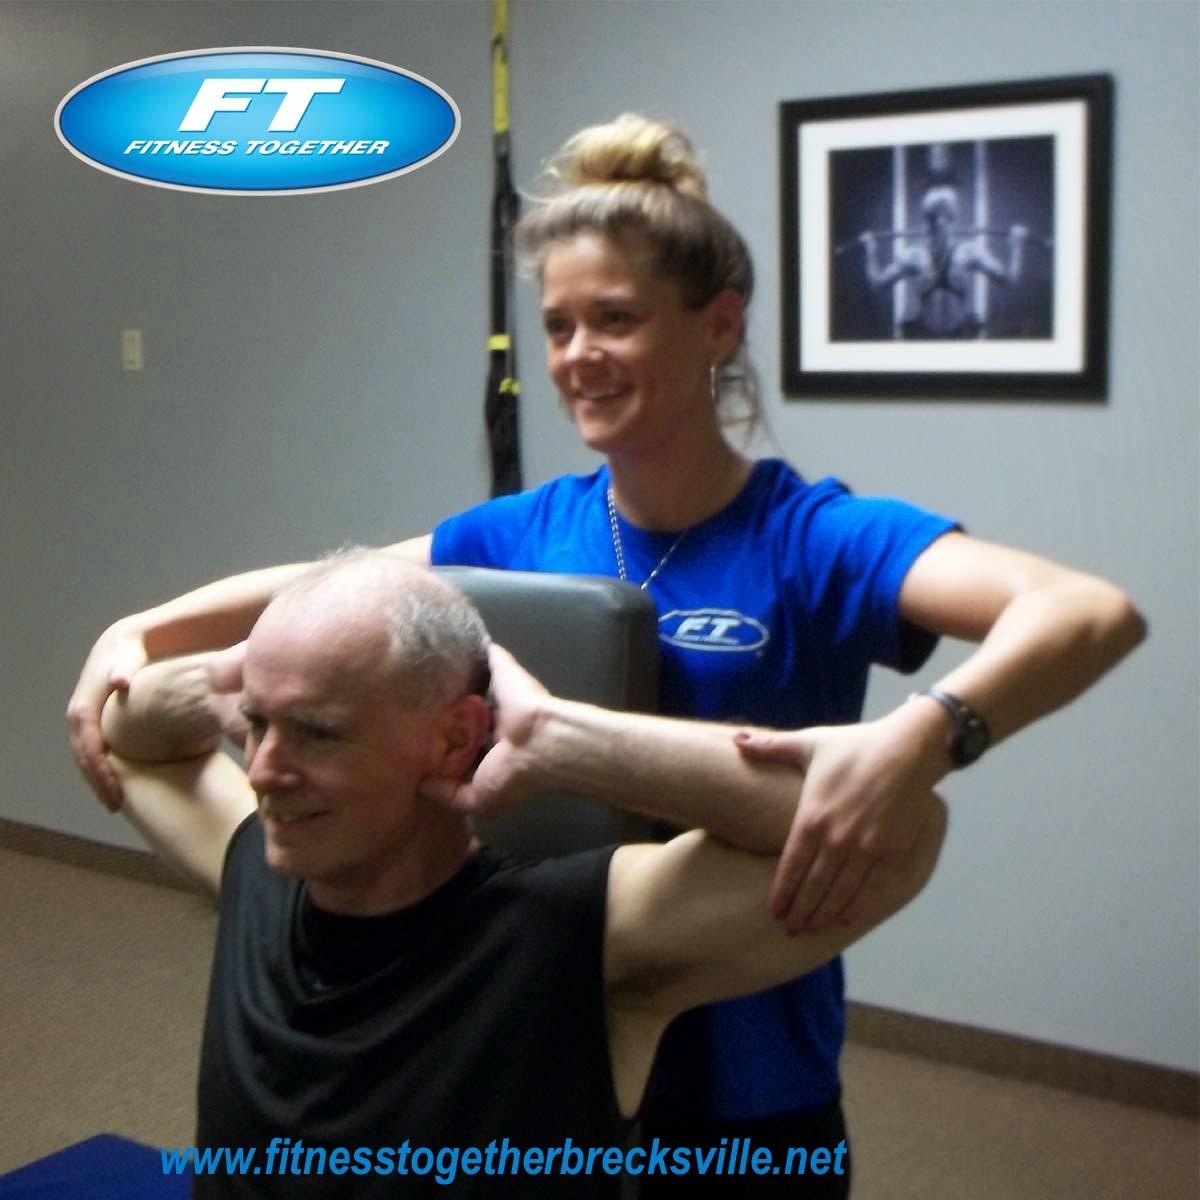 http://www.fitnesstogetherbrecksville.net